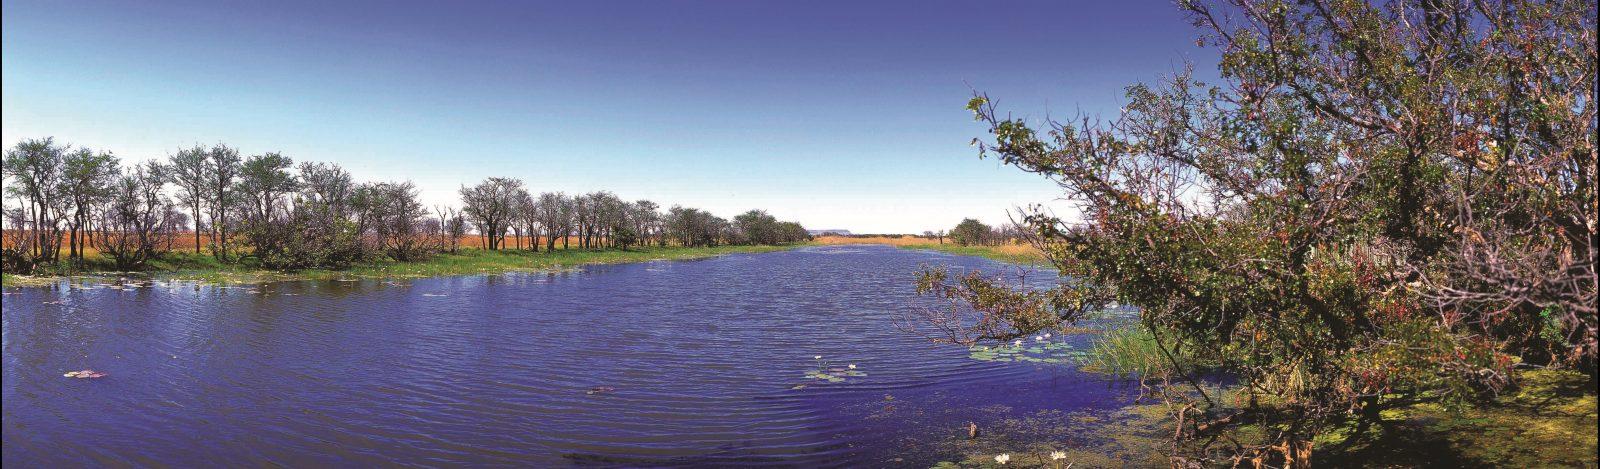 Parry Lagoons Nature Reserve, Wyndham, Western Australia